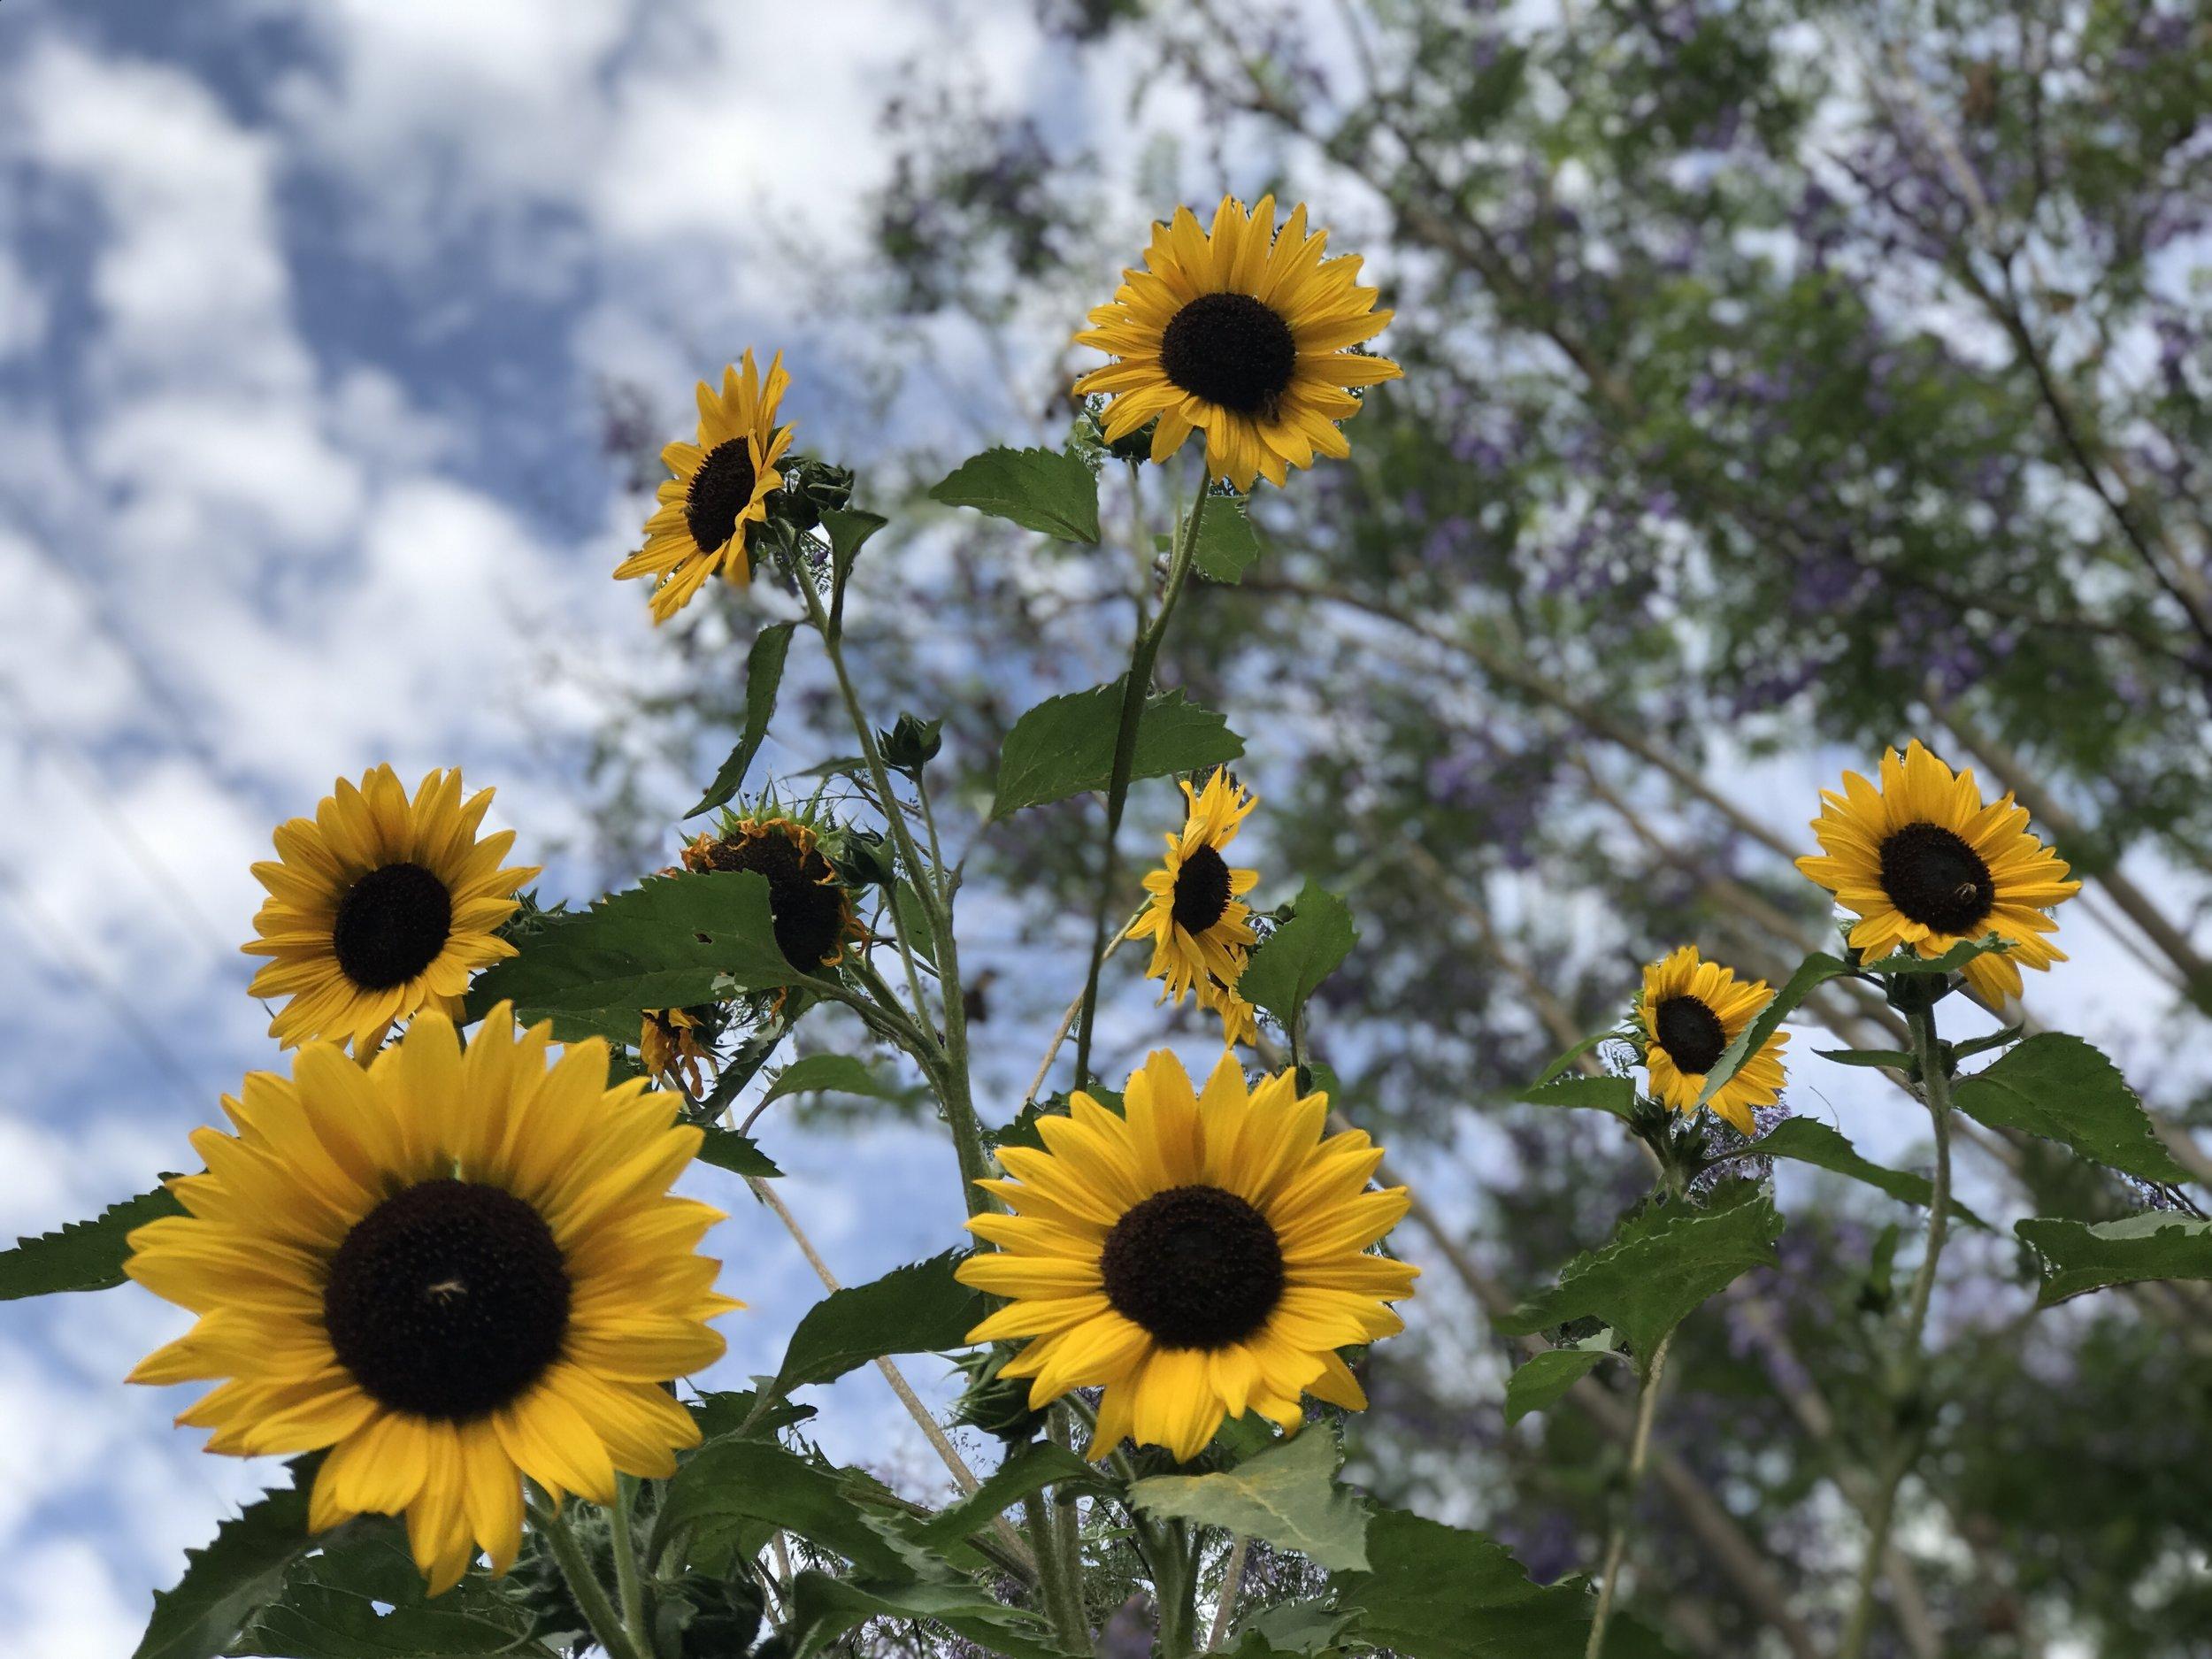 Sunflowers in Studio City